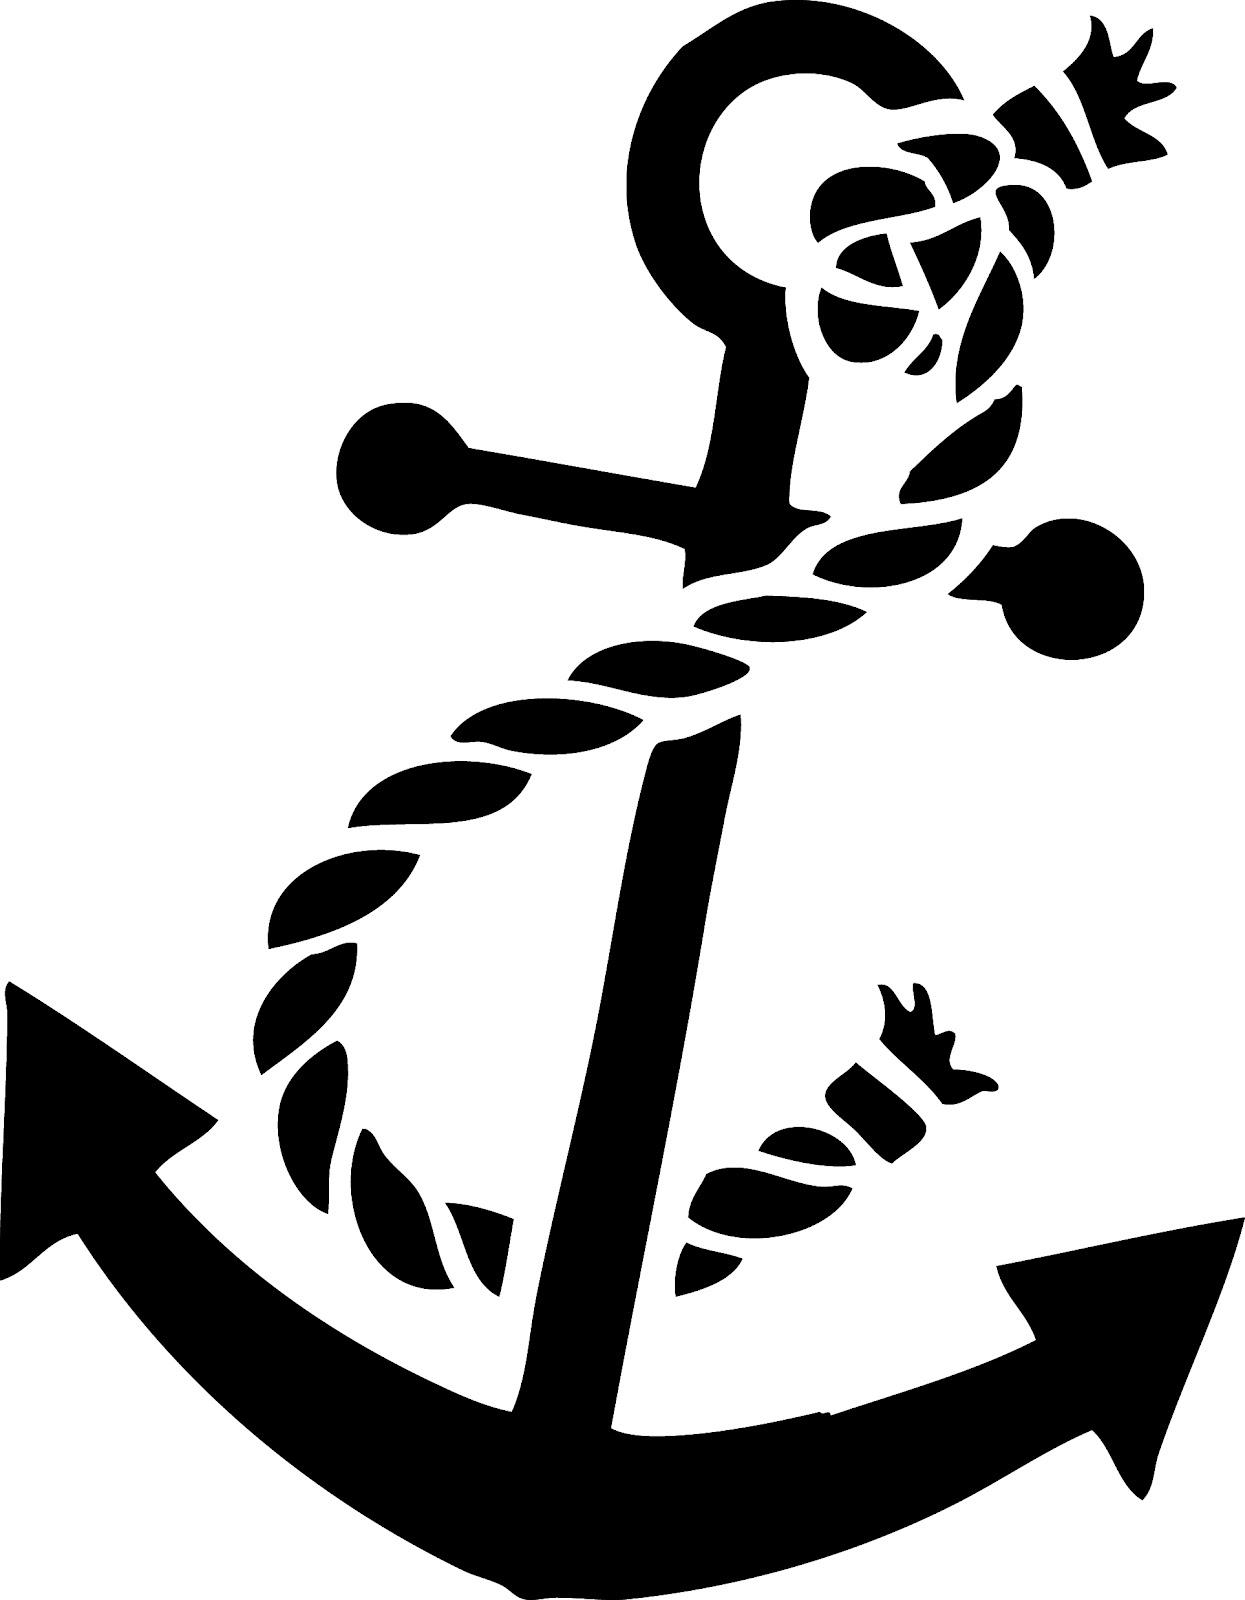 Clip art panda free. Anchor clipart vintage